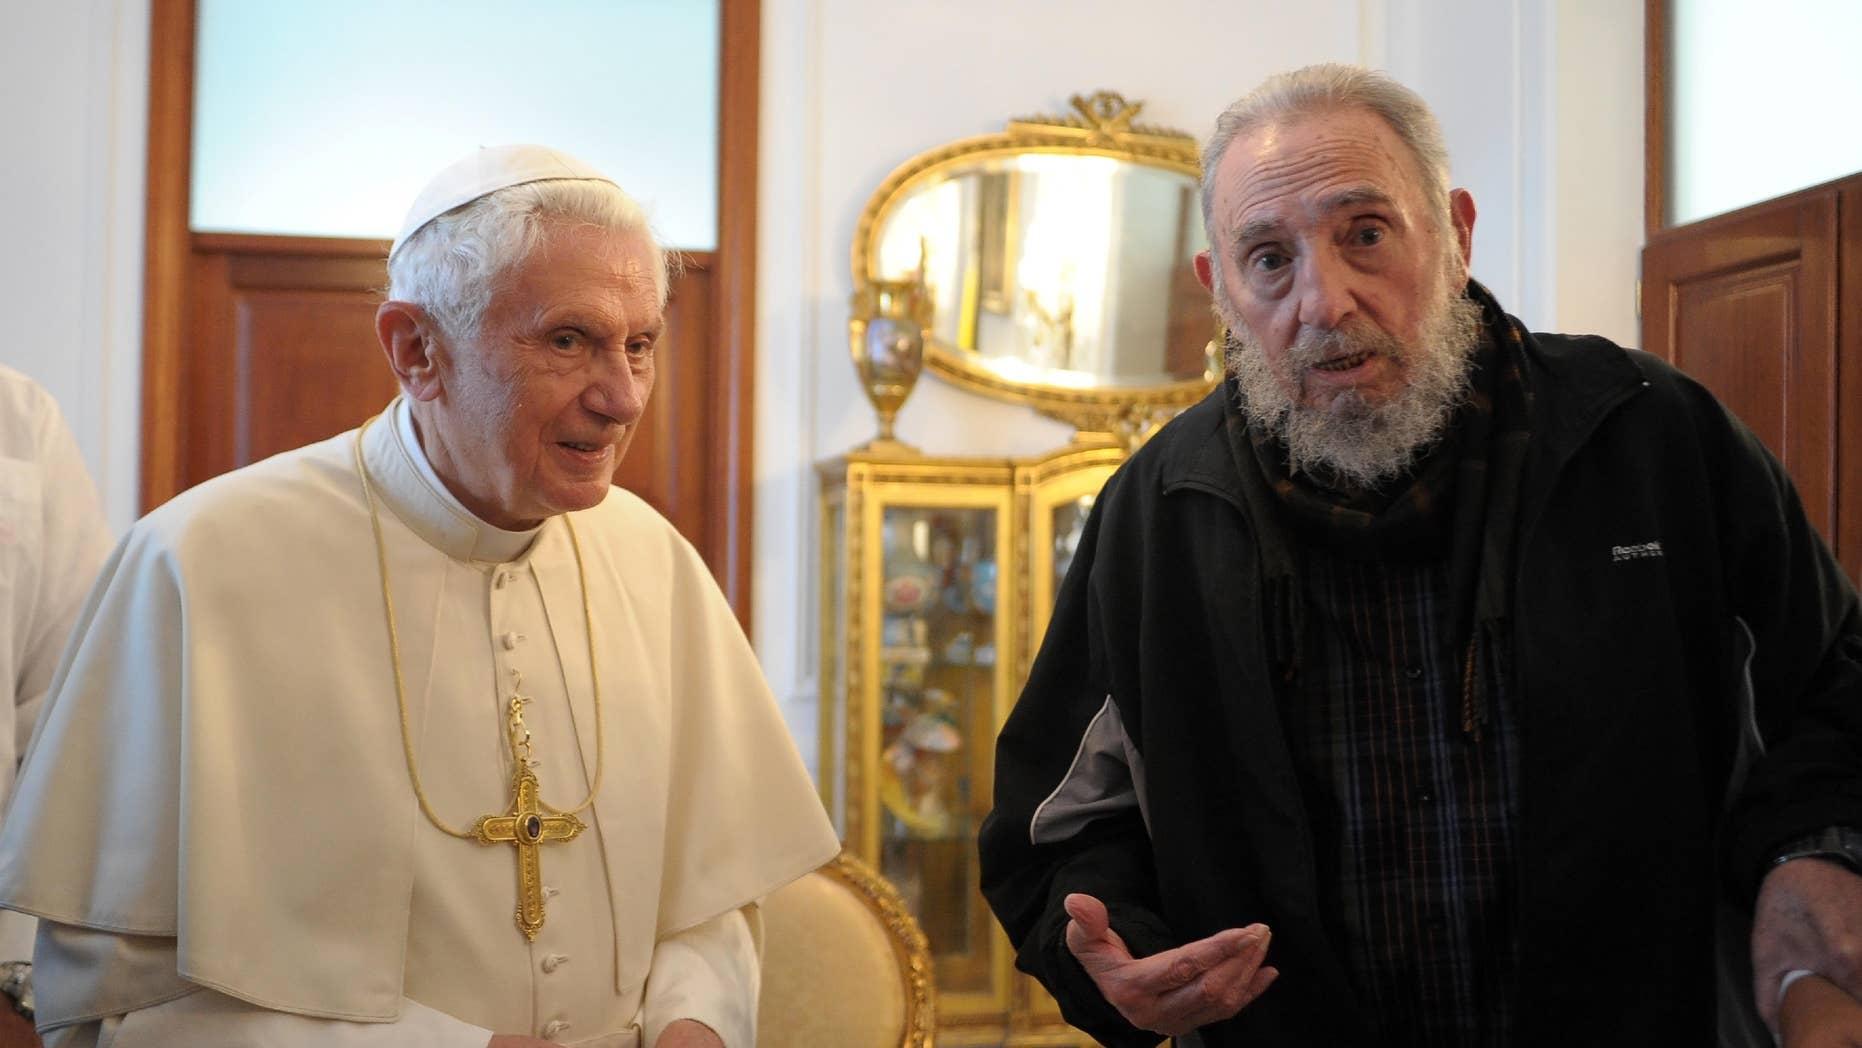 Fidel Castro's last public appearance was in March when he greeted Pope Benedict XVI in Cuba.